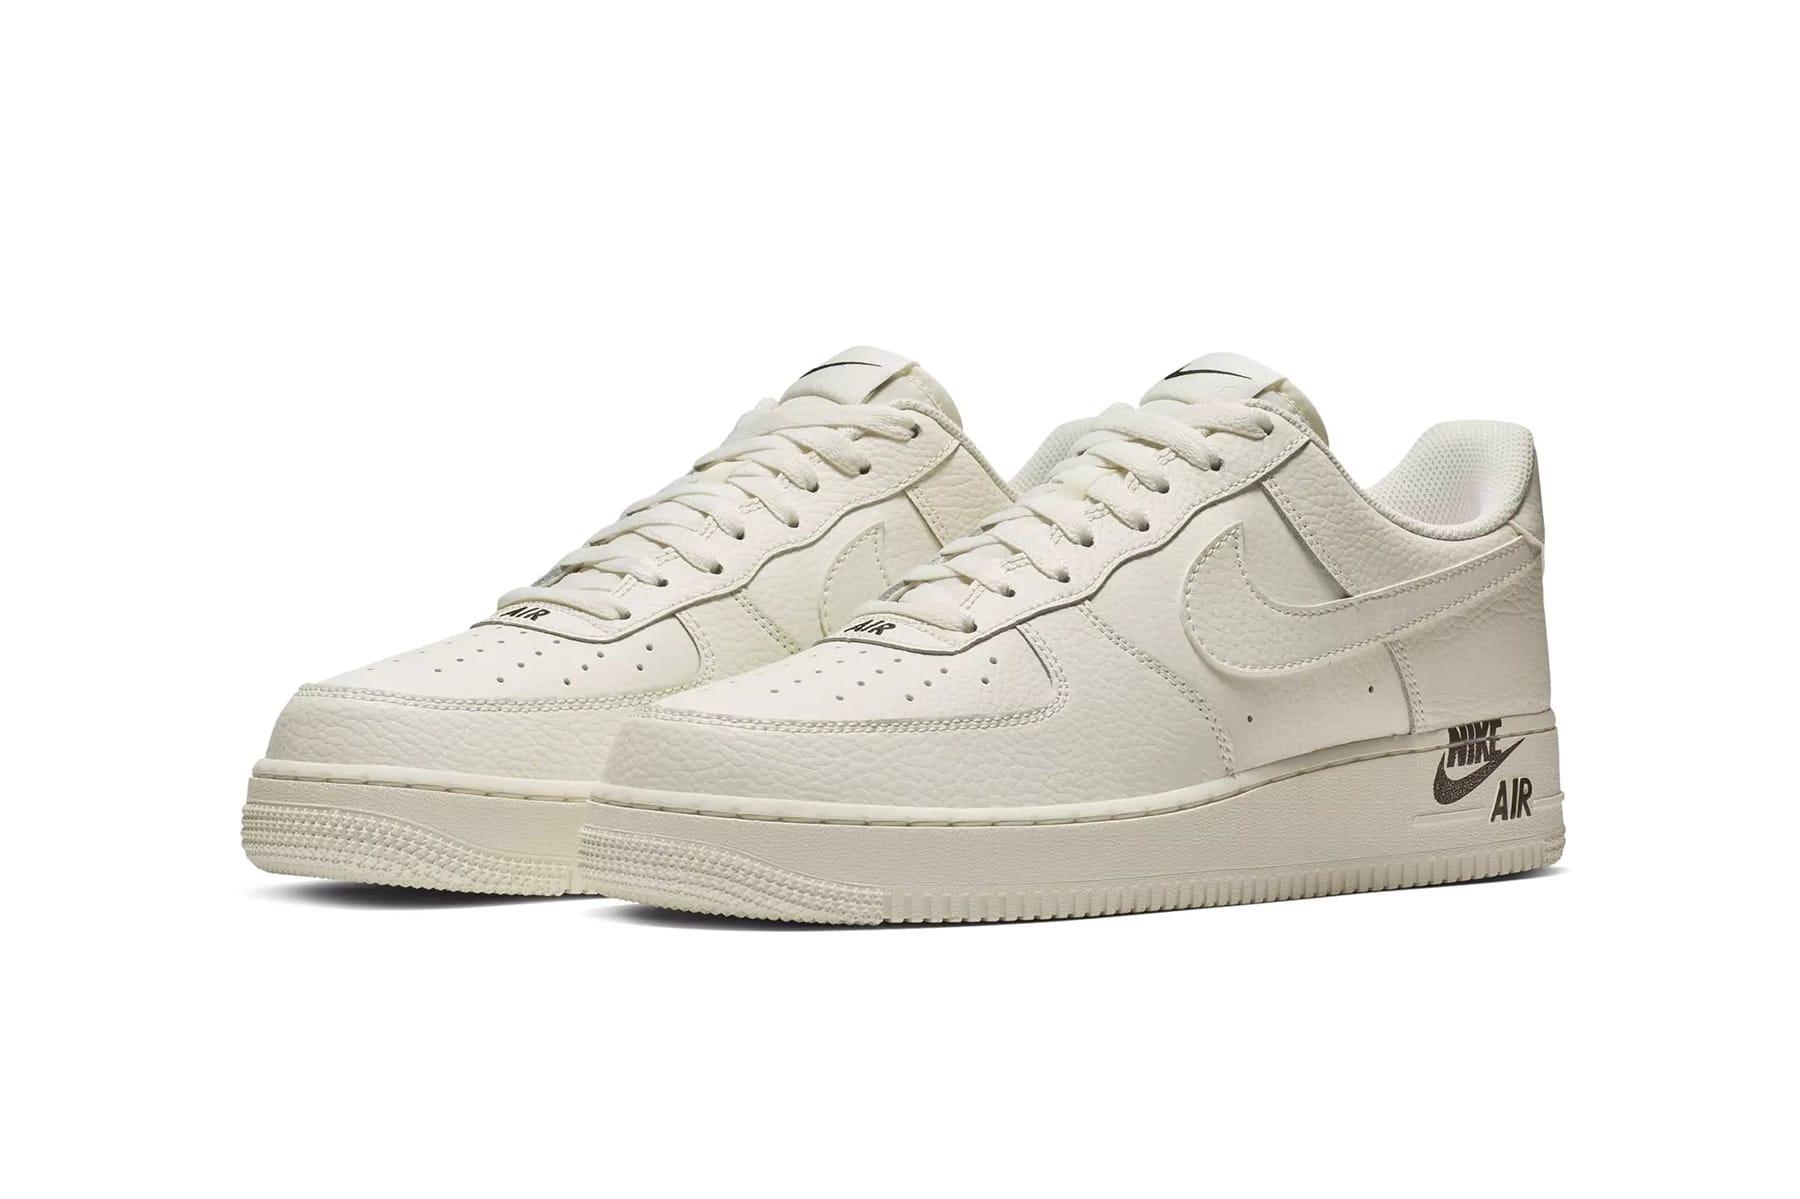 Nike's Air Force 1 Shifts its Logos